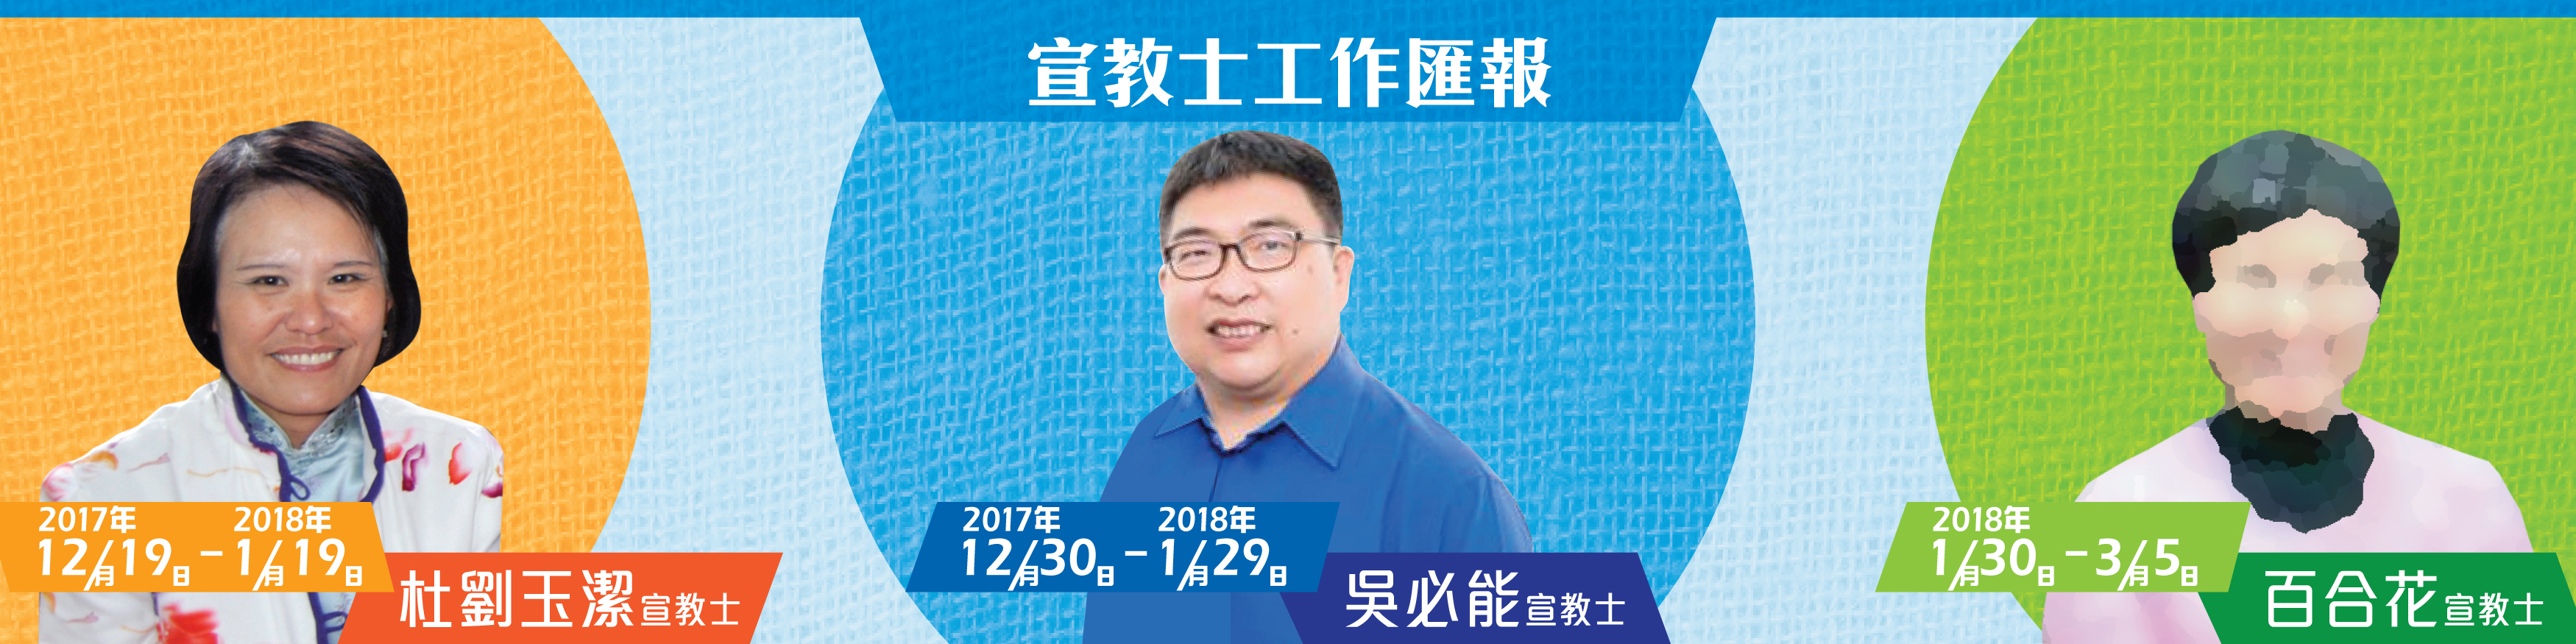 CB-宣教分享會-web-banner-02-1680-x-420-011